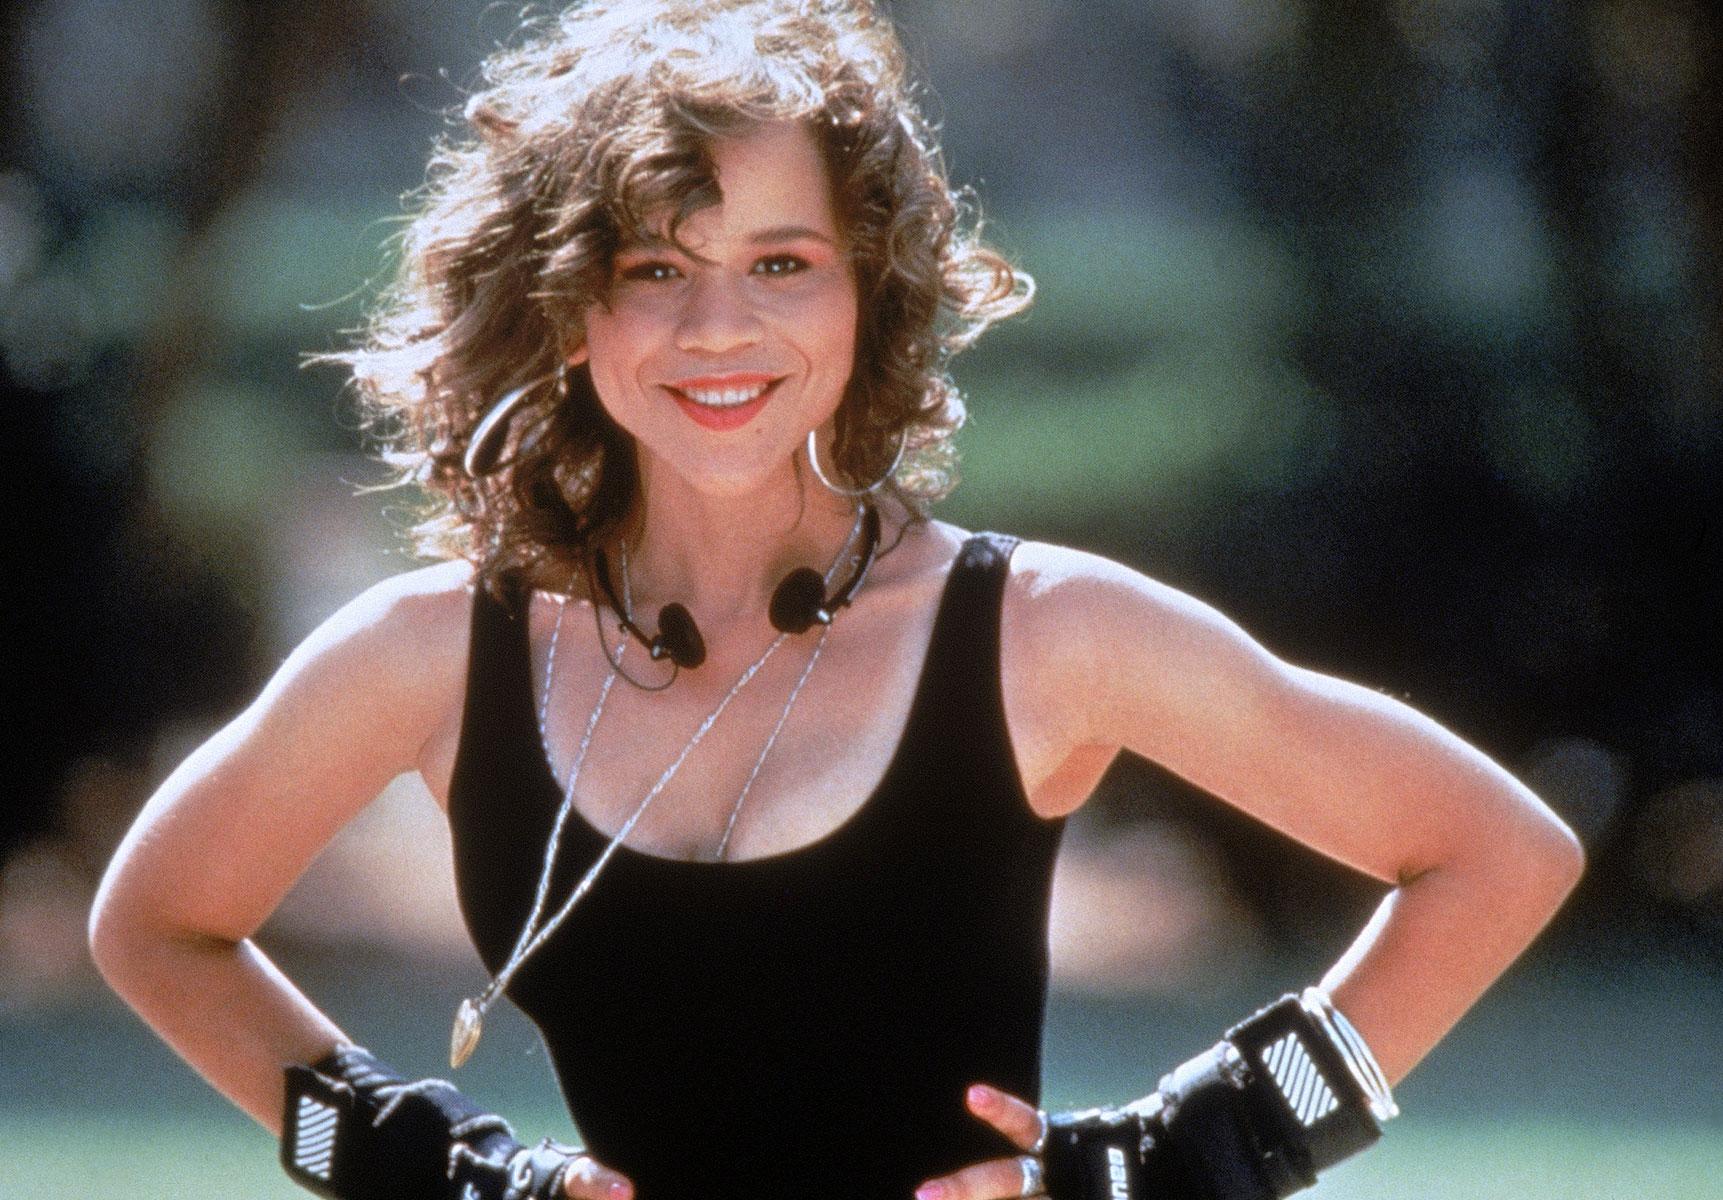 Rosie Perezs 5 Best Movie Roles & Where to Stream Them